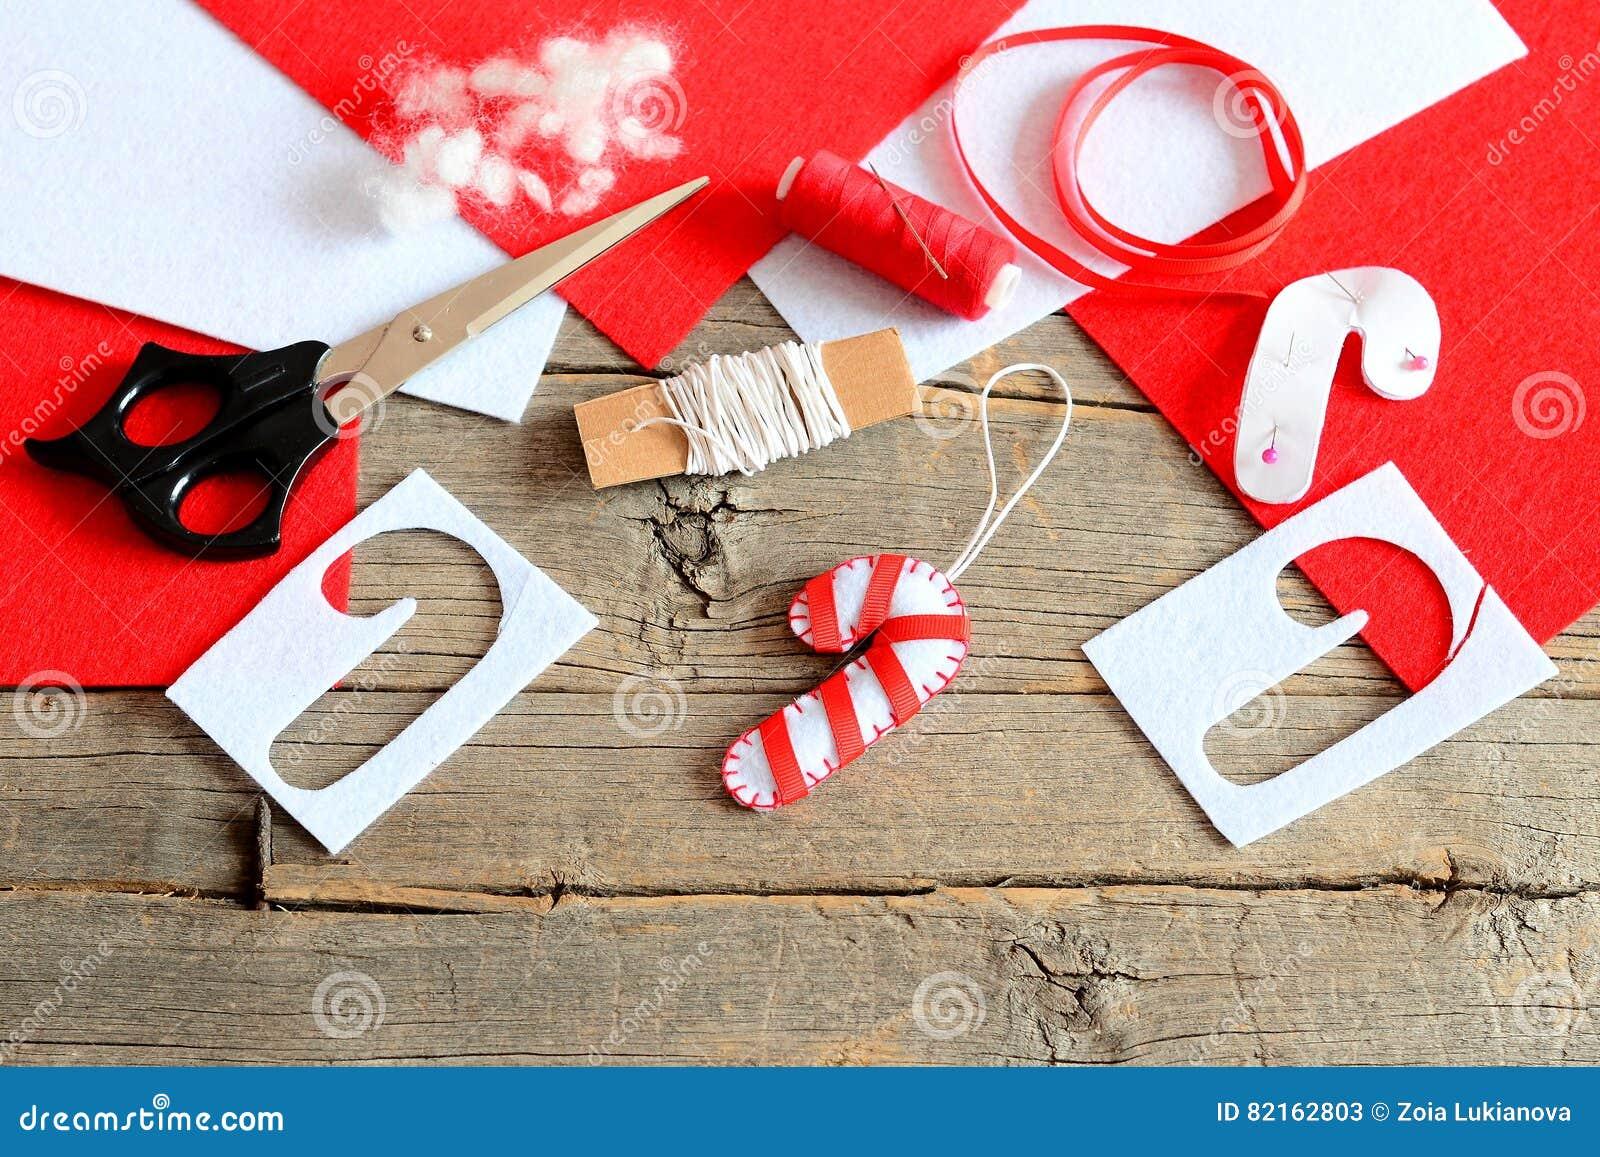 Felt Christmas Tree Candy Cane Ornament, Scissors, Paper Template ...